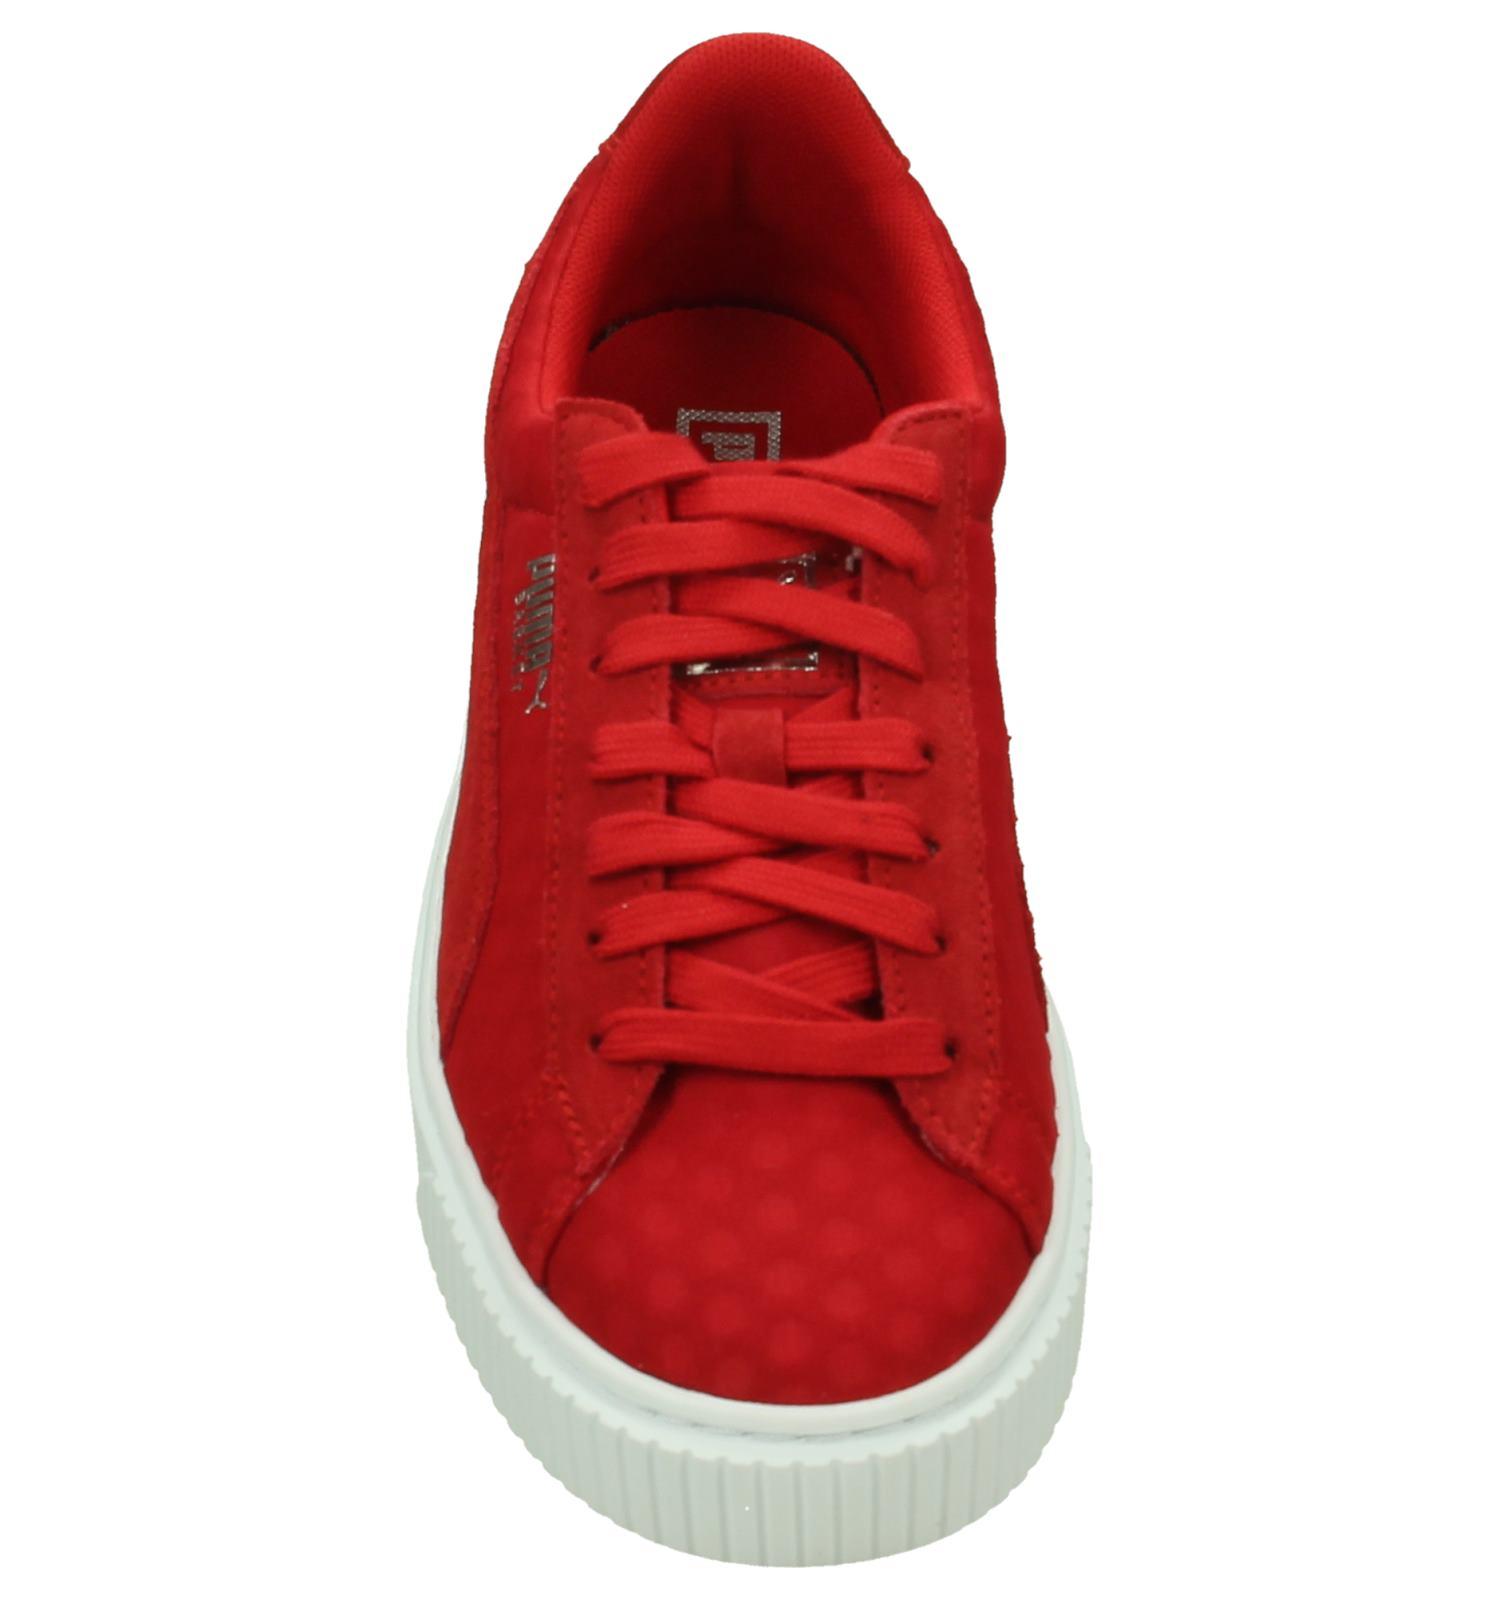 Gratis En Platform Verzend Puma Basket SneakersTorfs be Rode Retour UzpjSLVGqM